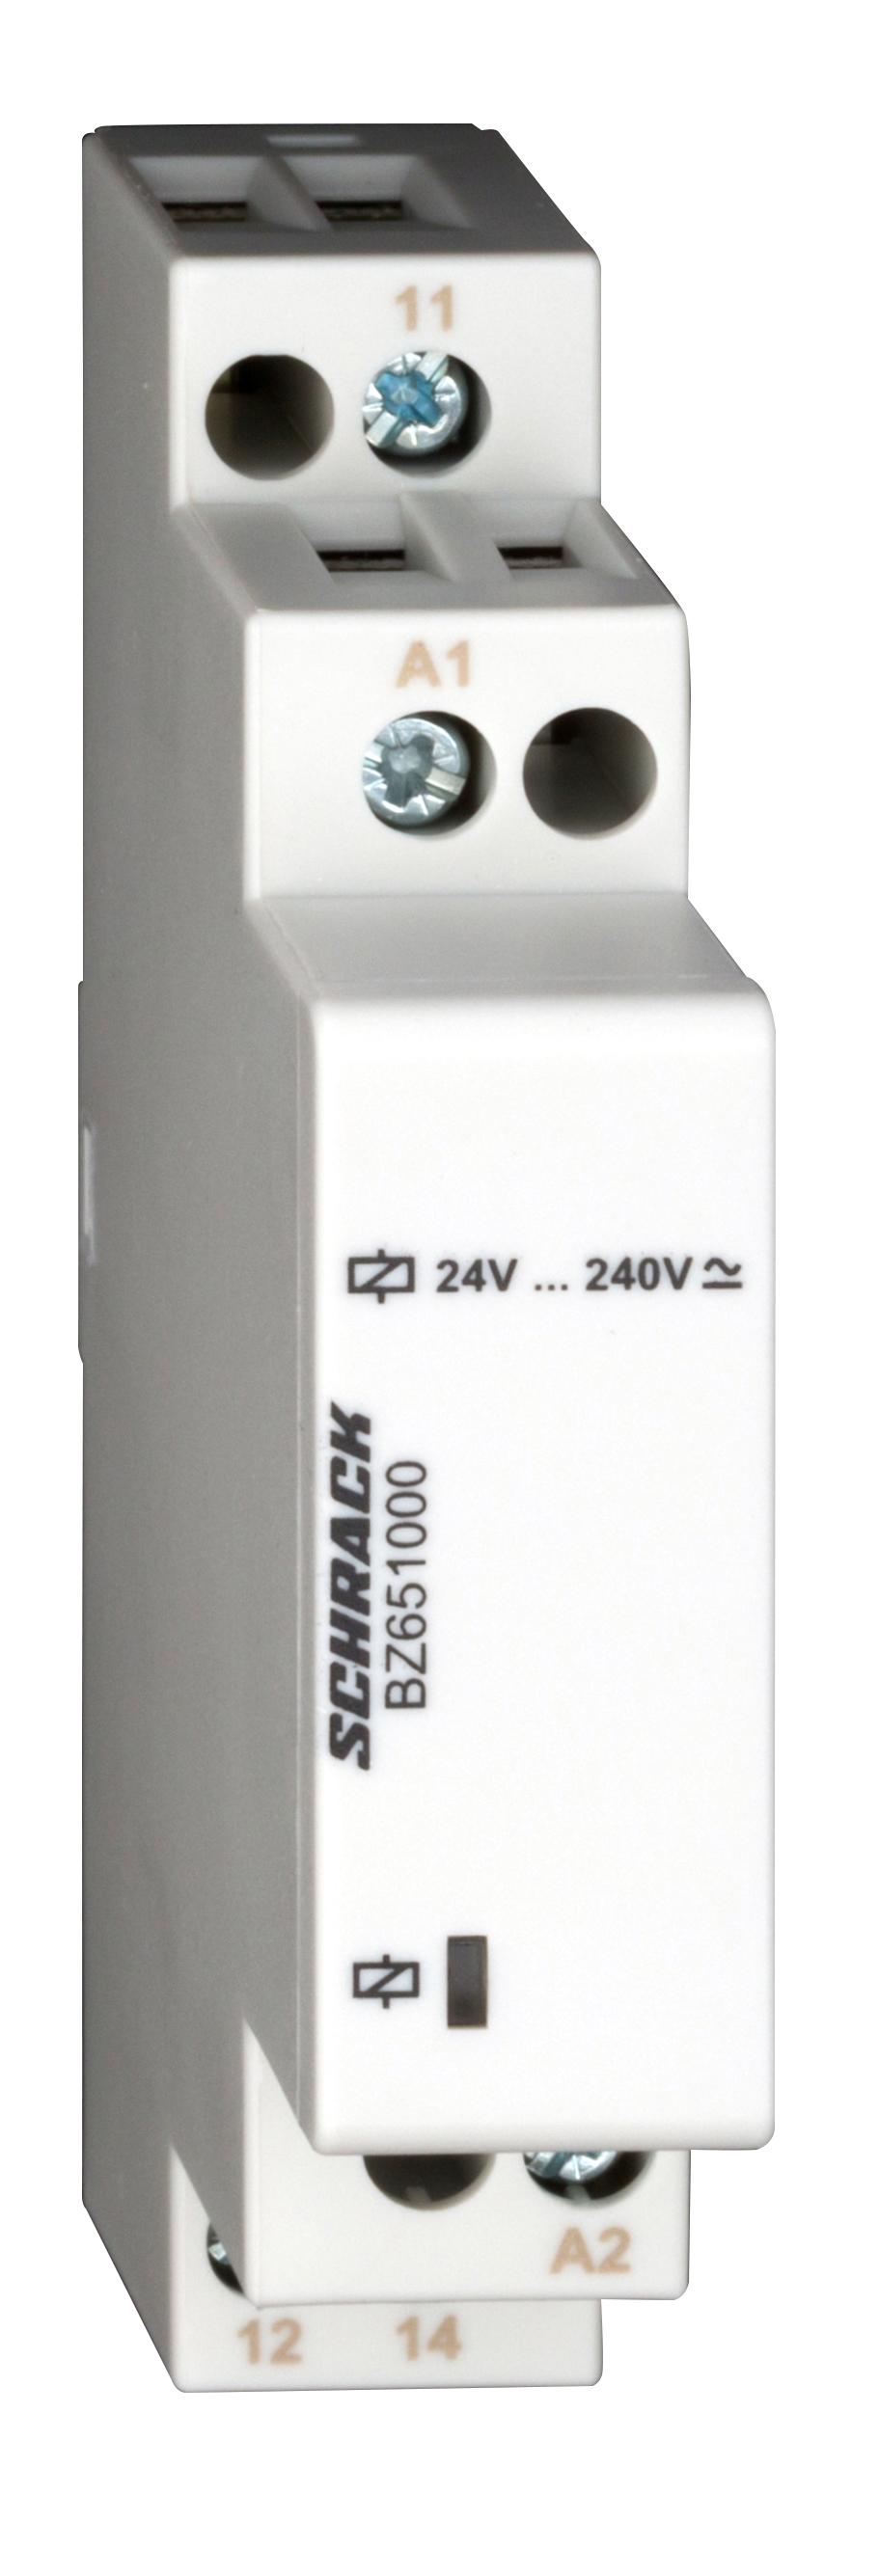 1 Stk Reiheneinbau-Relais, 1 Wechsler, 24-240V AC/DC BZ651000--